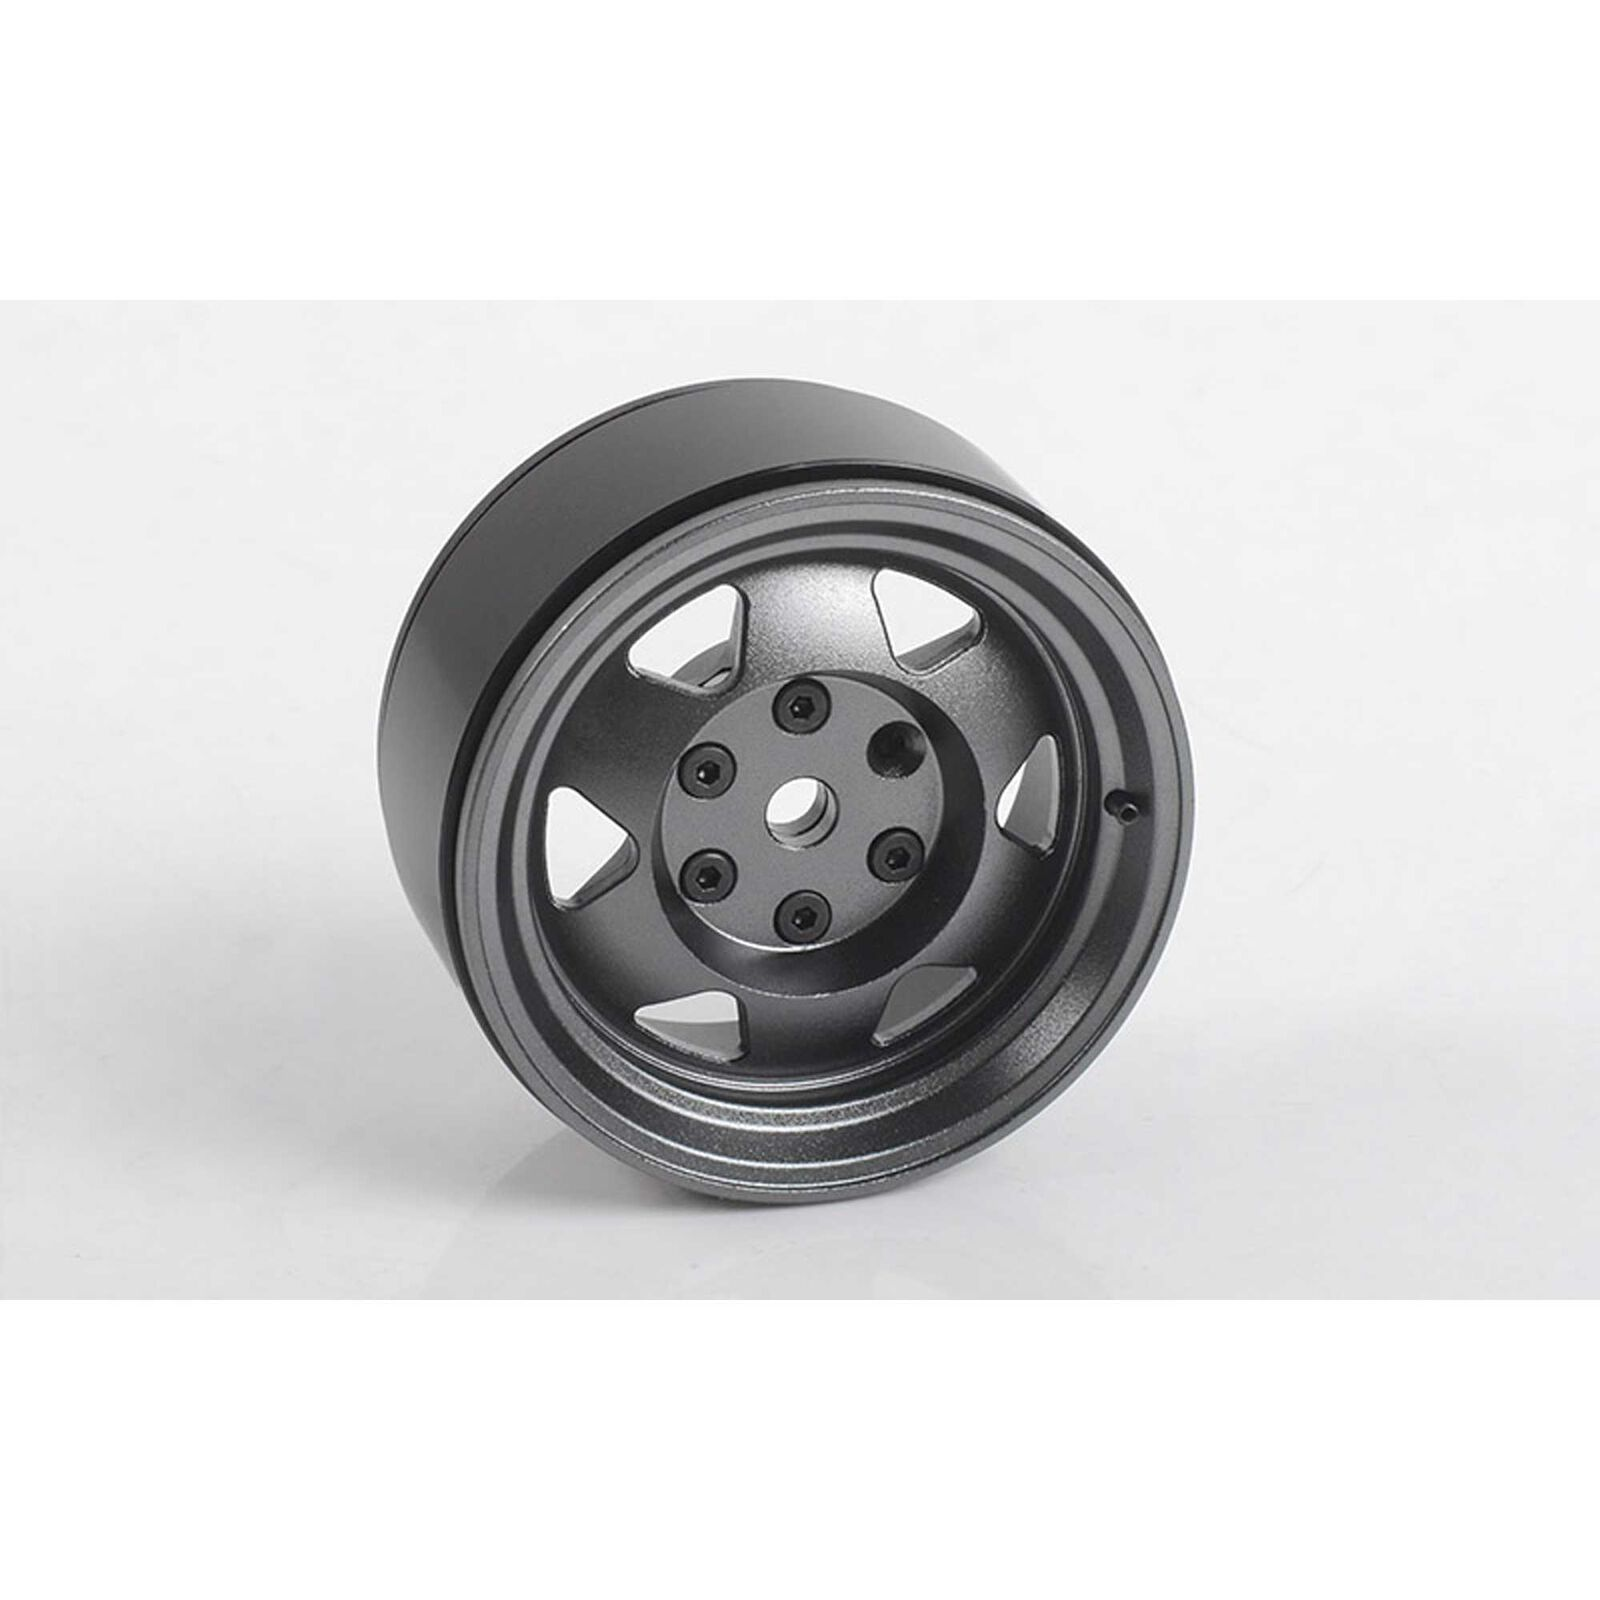 1/10 OEM XJ 1.9 Front/Rear Beadlock Crawler Wheels, 12mm Hex, Gunmetal (4)